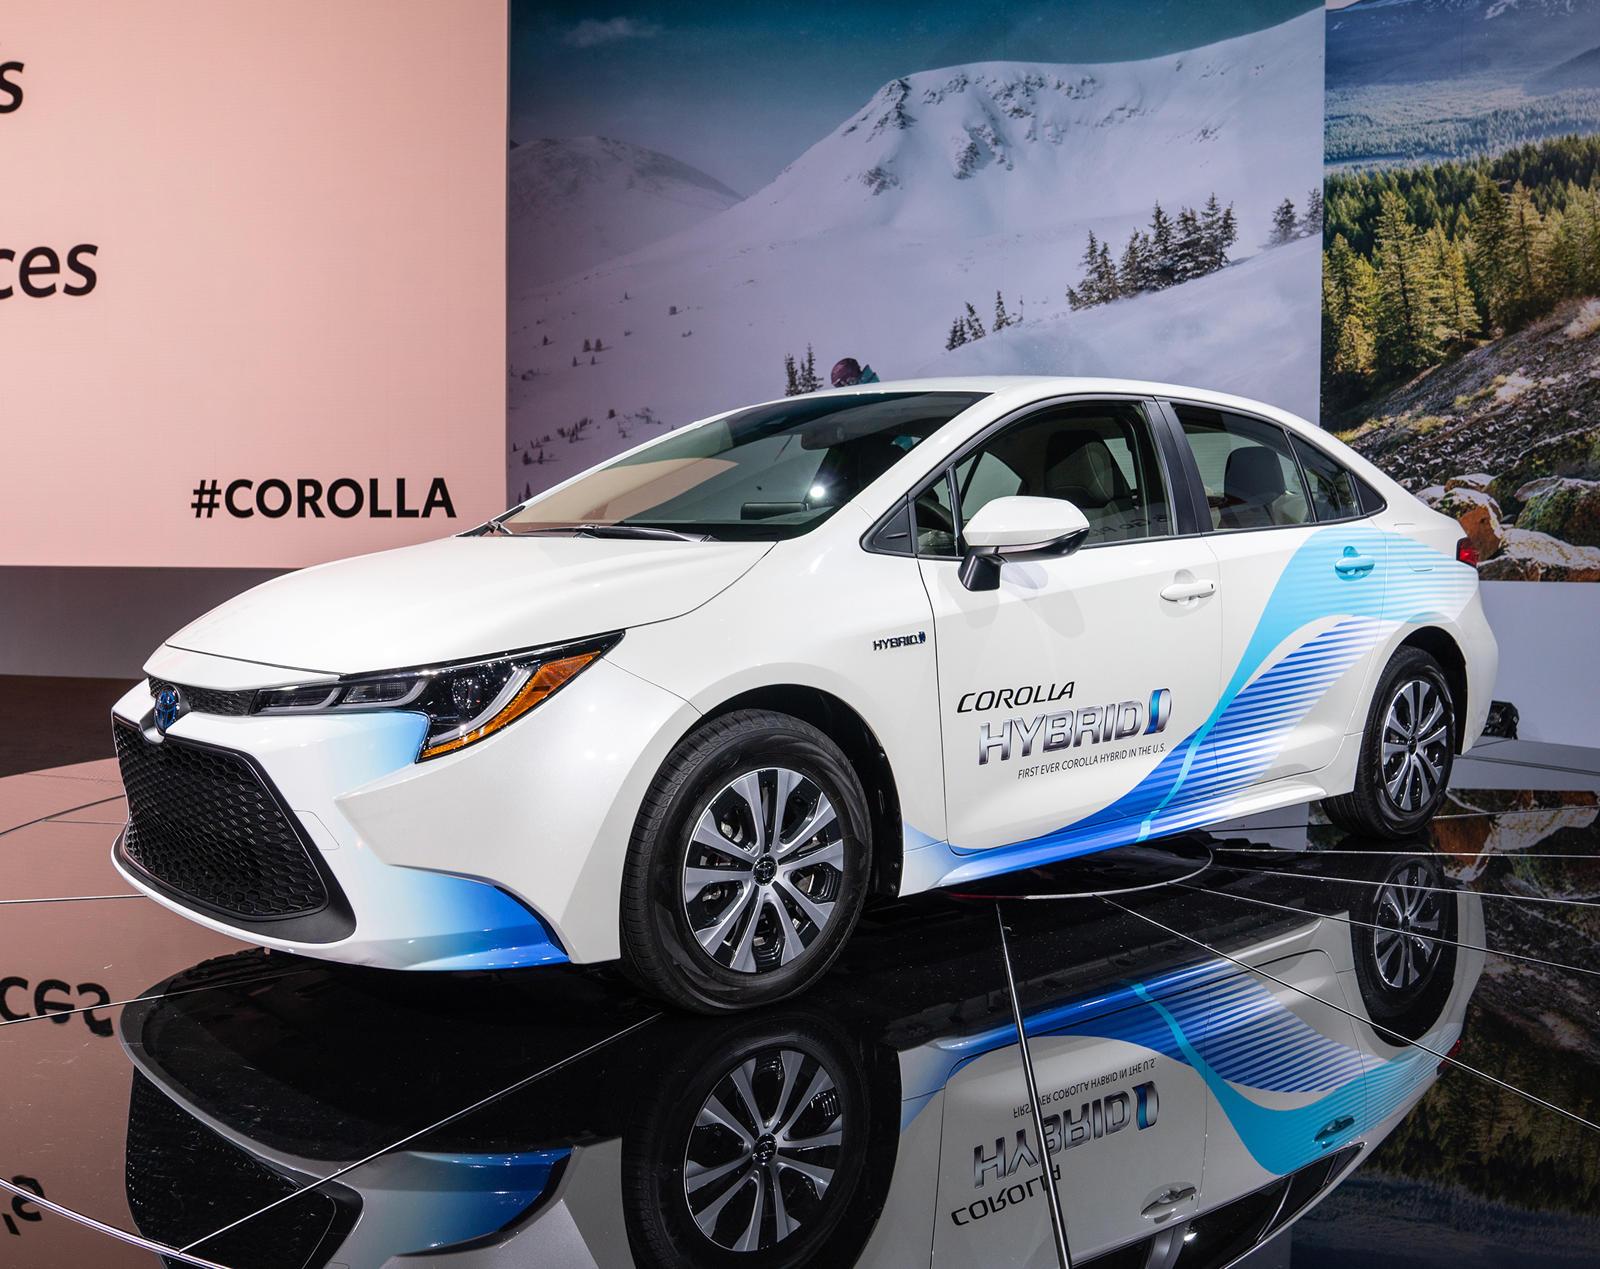 New Prius 2020 2020 Toyota Corolla Hybrid Is The New Prius | CarBuzz